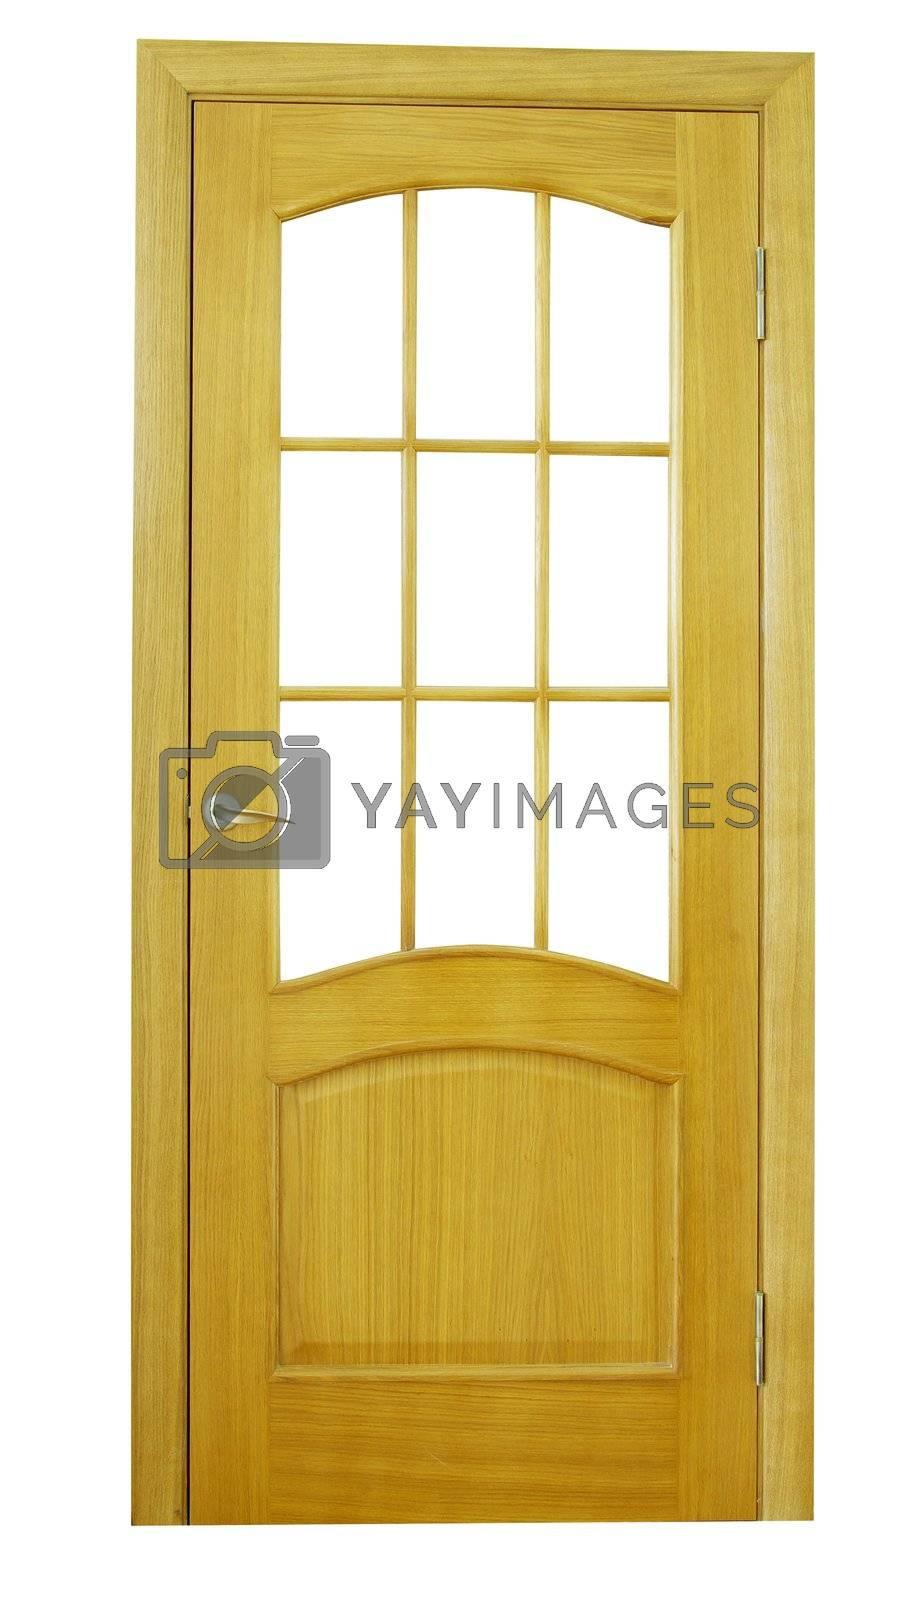 wooden door isolated on white